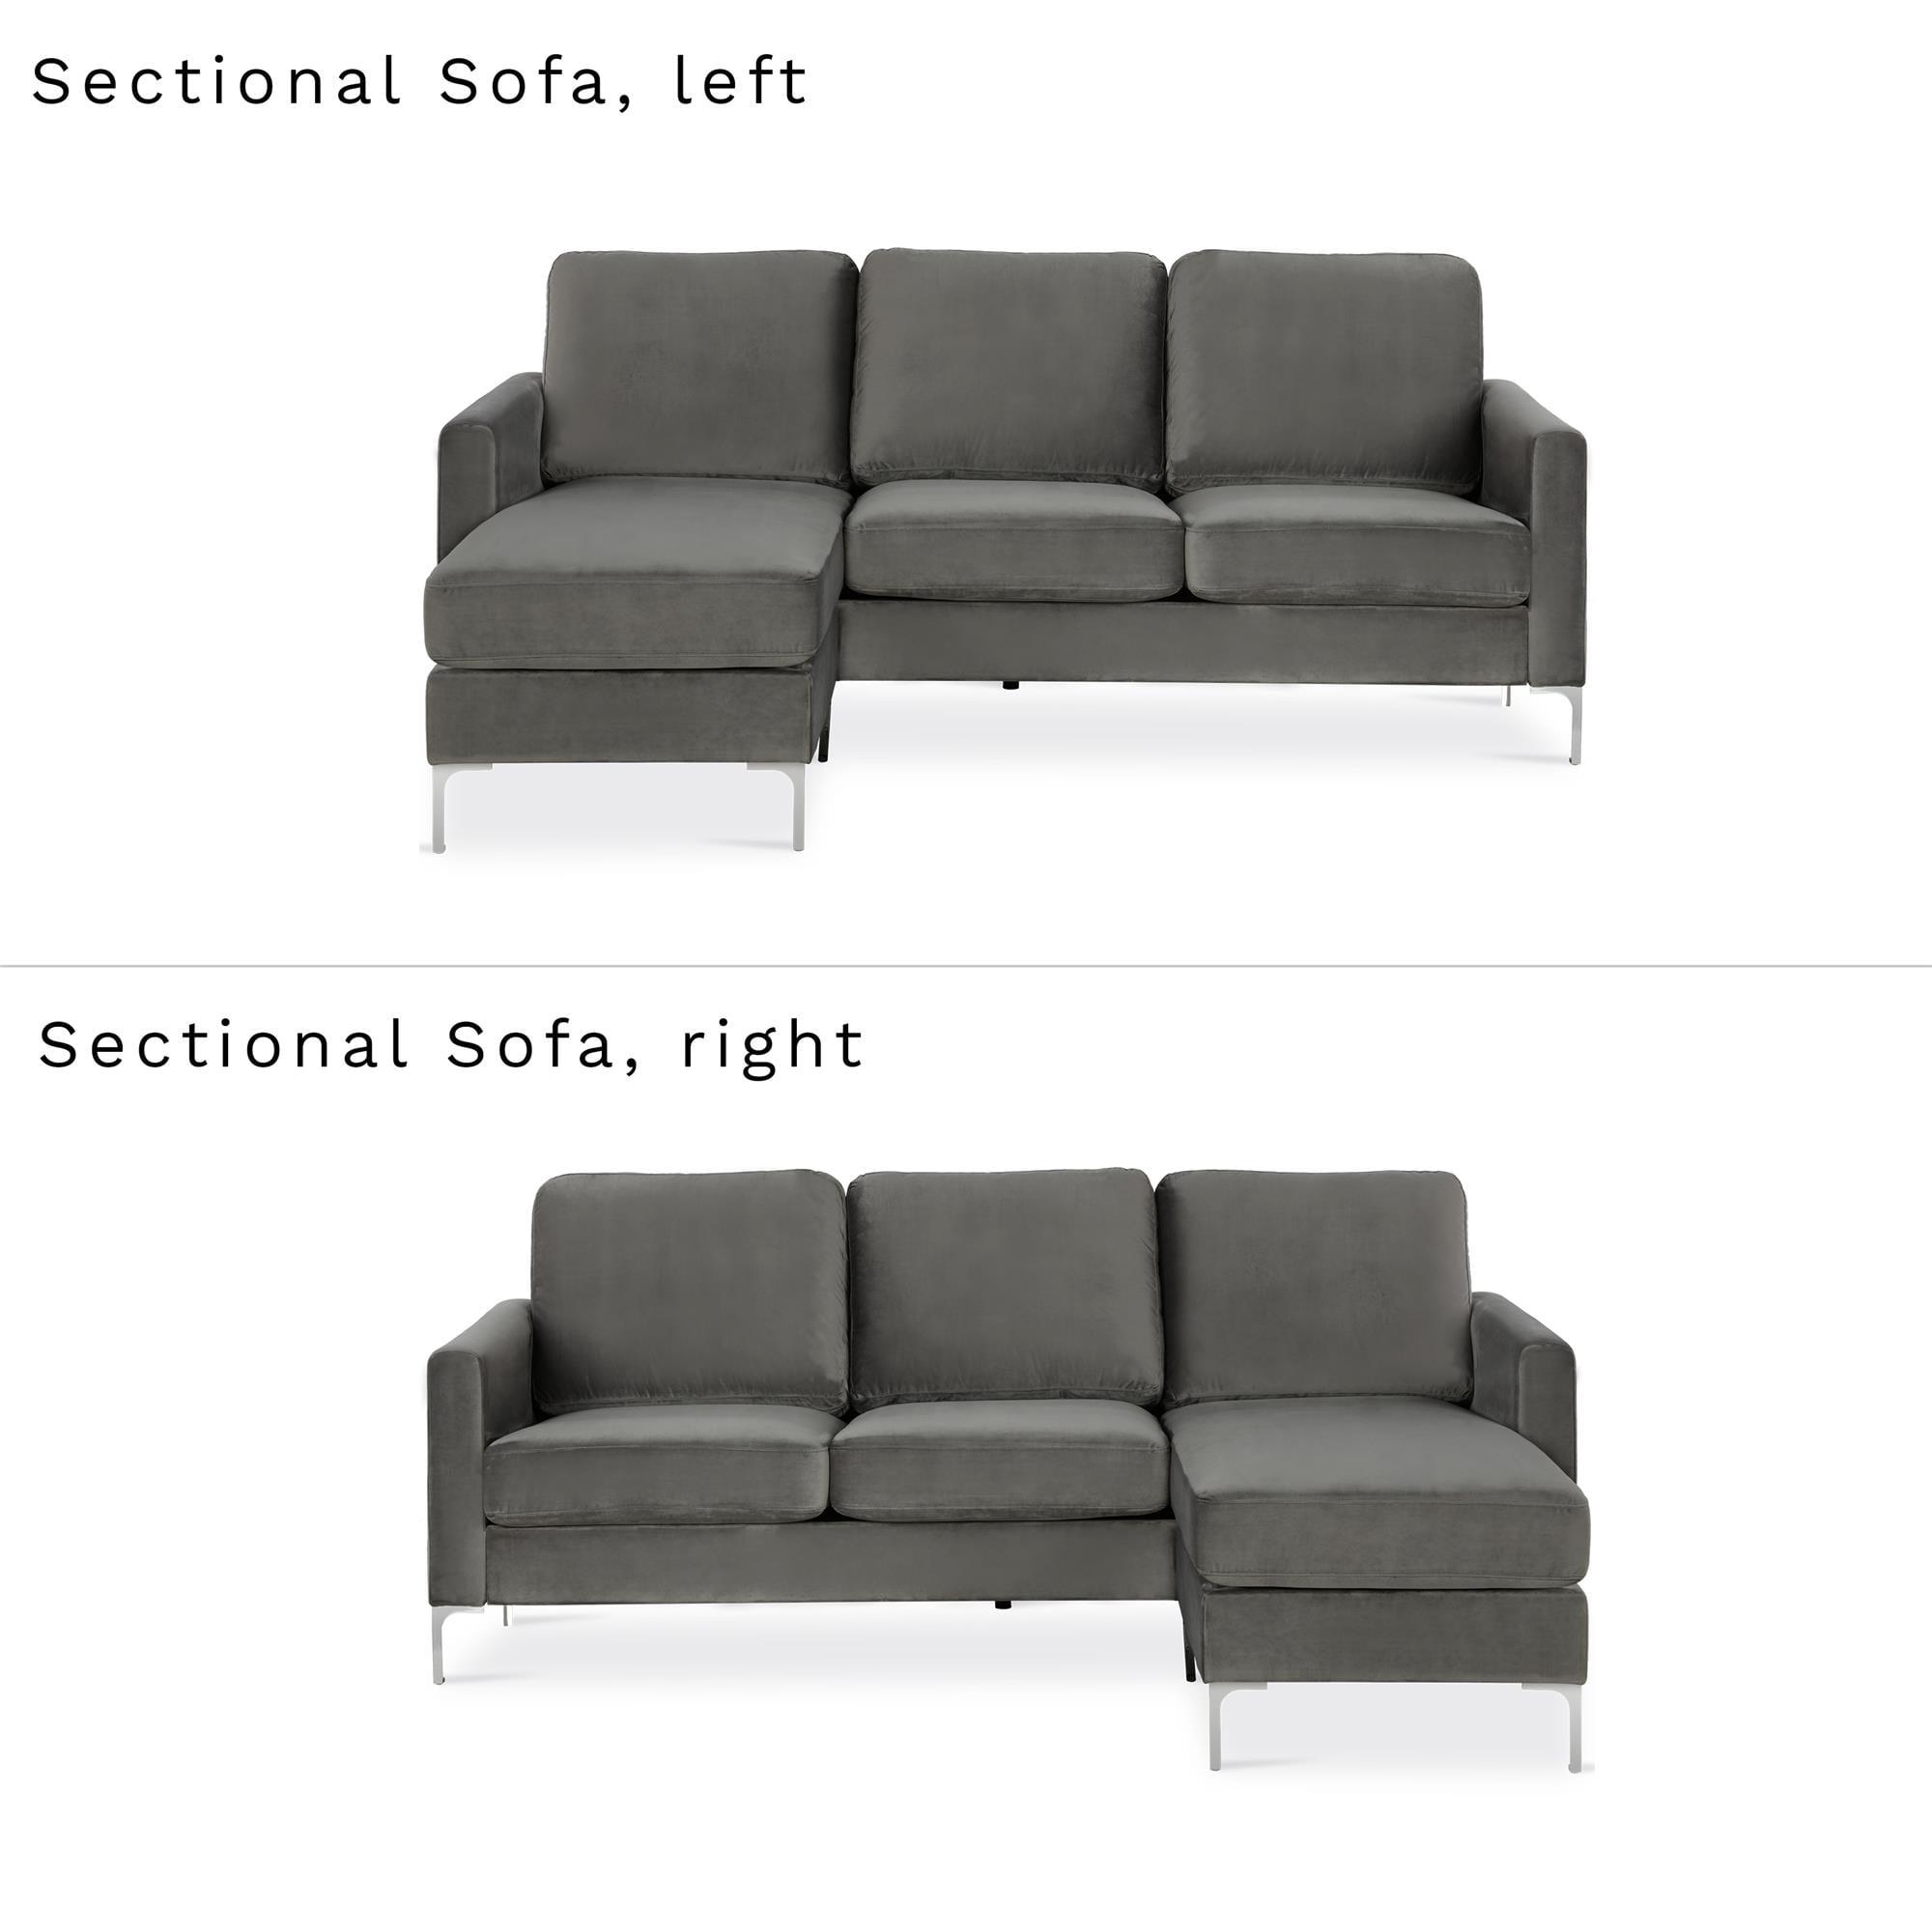 Admirable Novogratz Chapman Sectional Sofa With Chrome Legs Gray Creativecarmelina Interior Chair Design Creativecarmelinacom